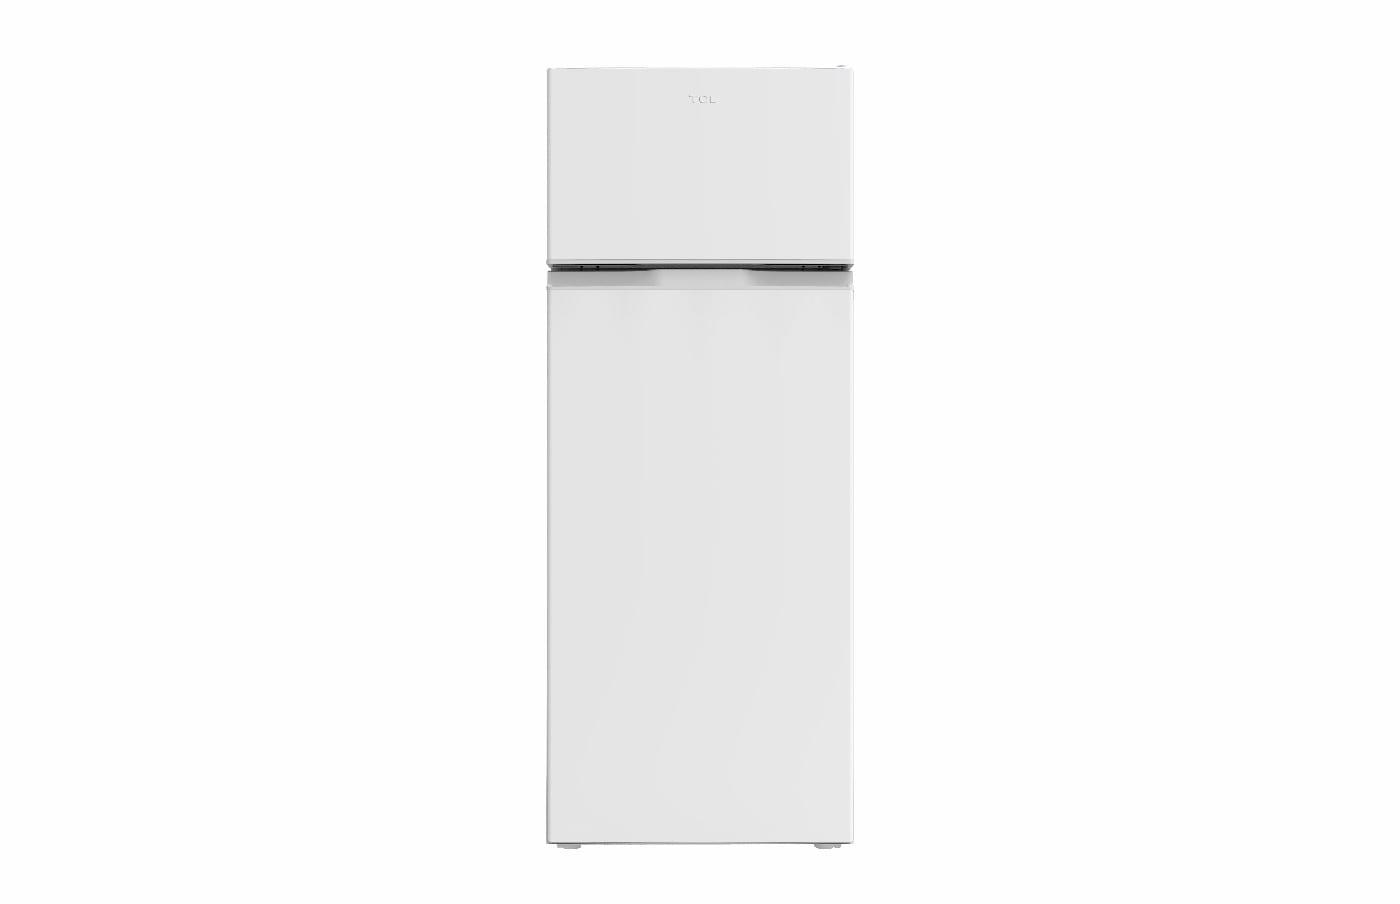 Tcl 260L Tm Double Door Ref, Defrost, White Color, 220-240V/50Hz, R600A, Condensor Inside, Bs Plug (W * D * H) 545*550*1440